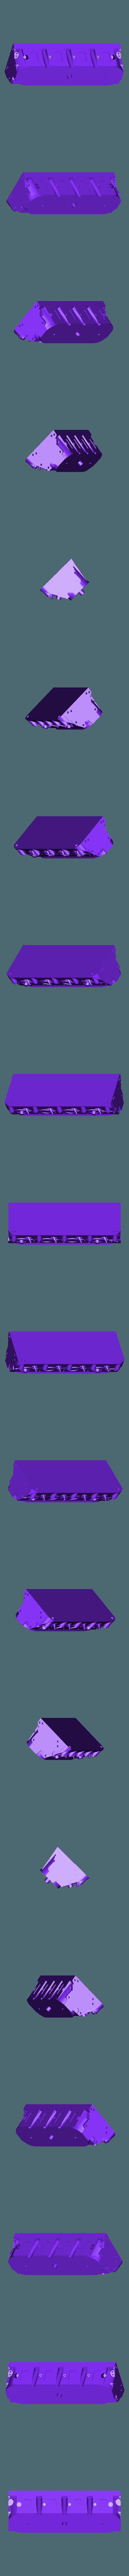 Cylinder_Head_A.STL Download STL file Fury road hotrod bodyshell 1/10 • 3D printing design, RCGANG93